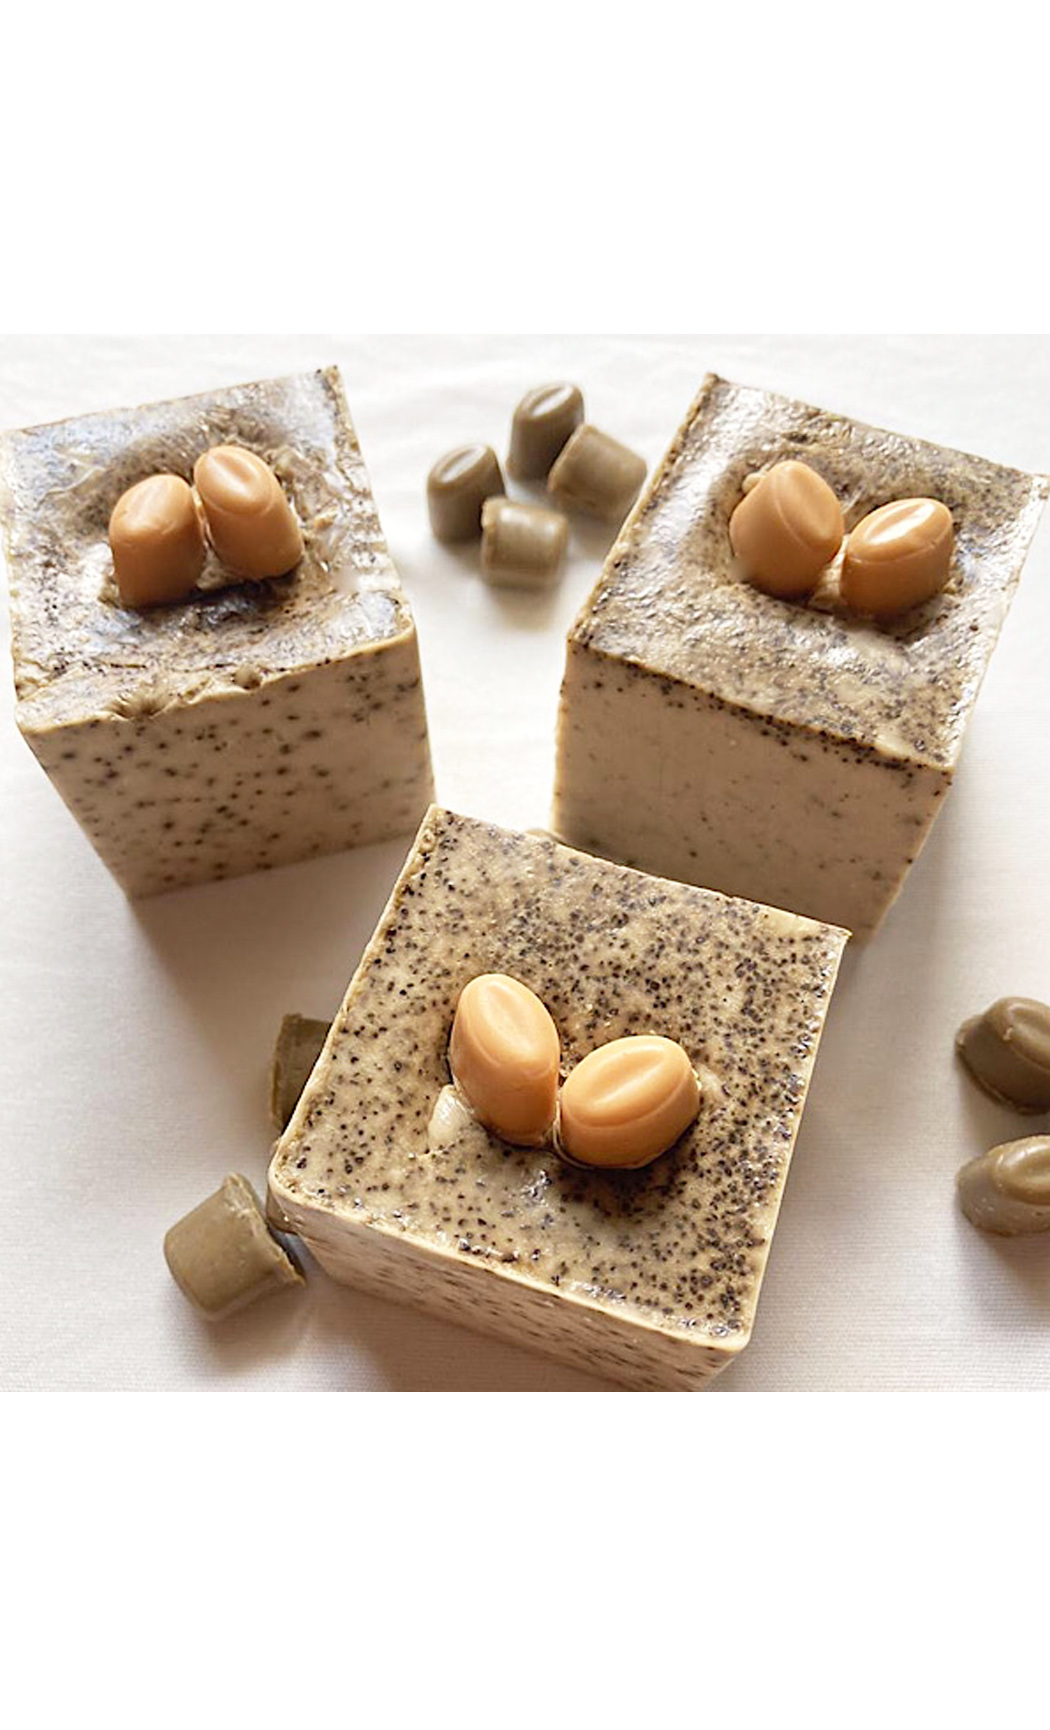 Coffee Scrub Handmade Soap. Buy Online